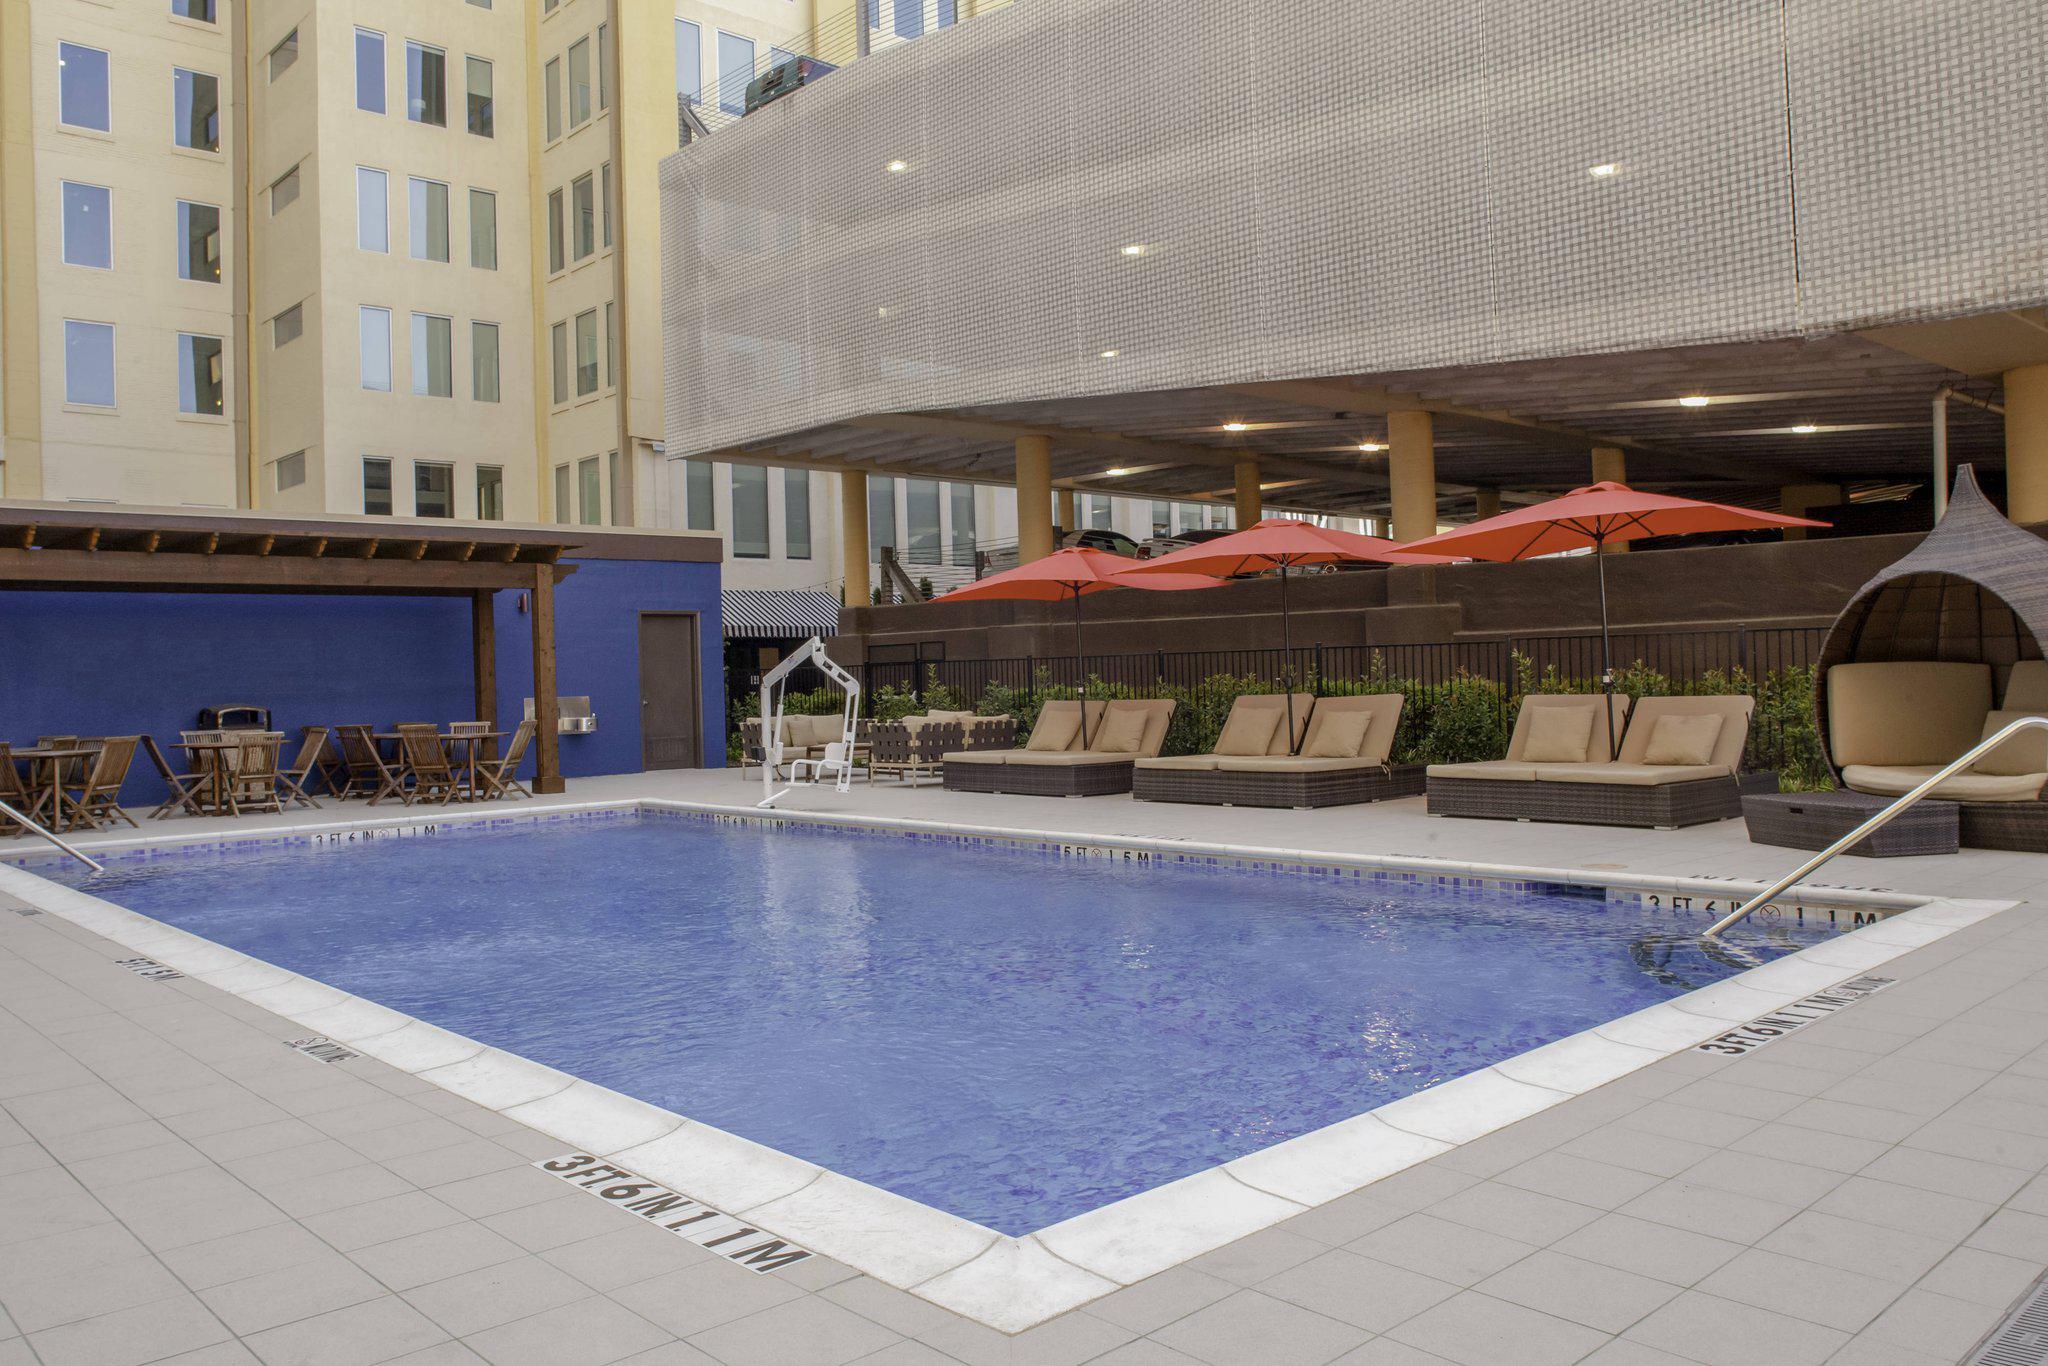 Fairfield Inn & Suites by Marriott Dallas Downtown